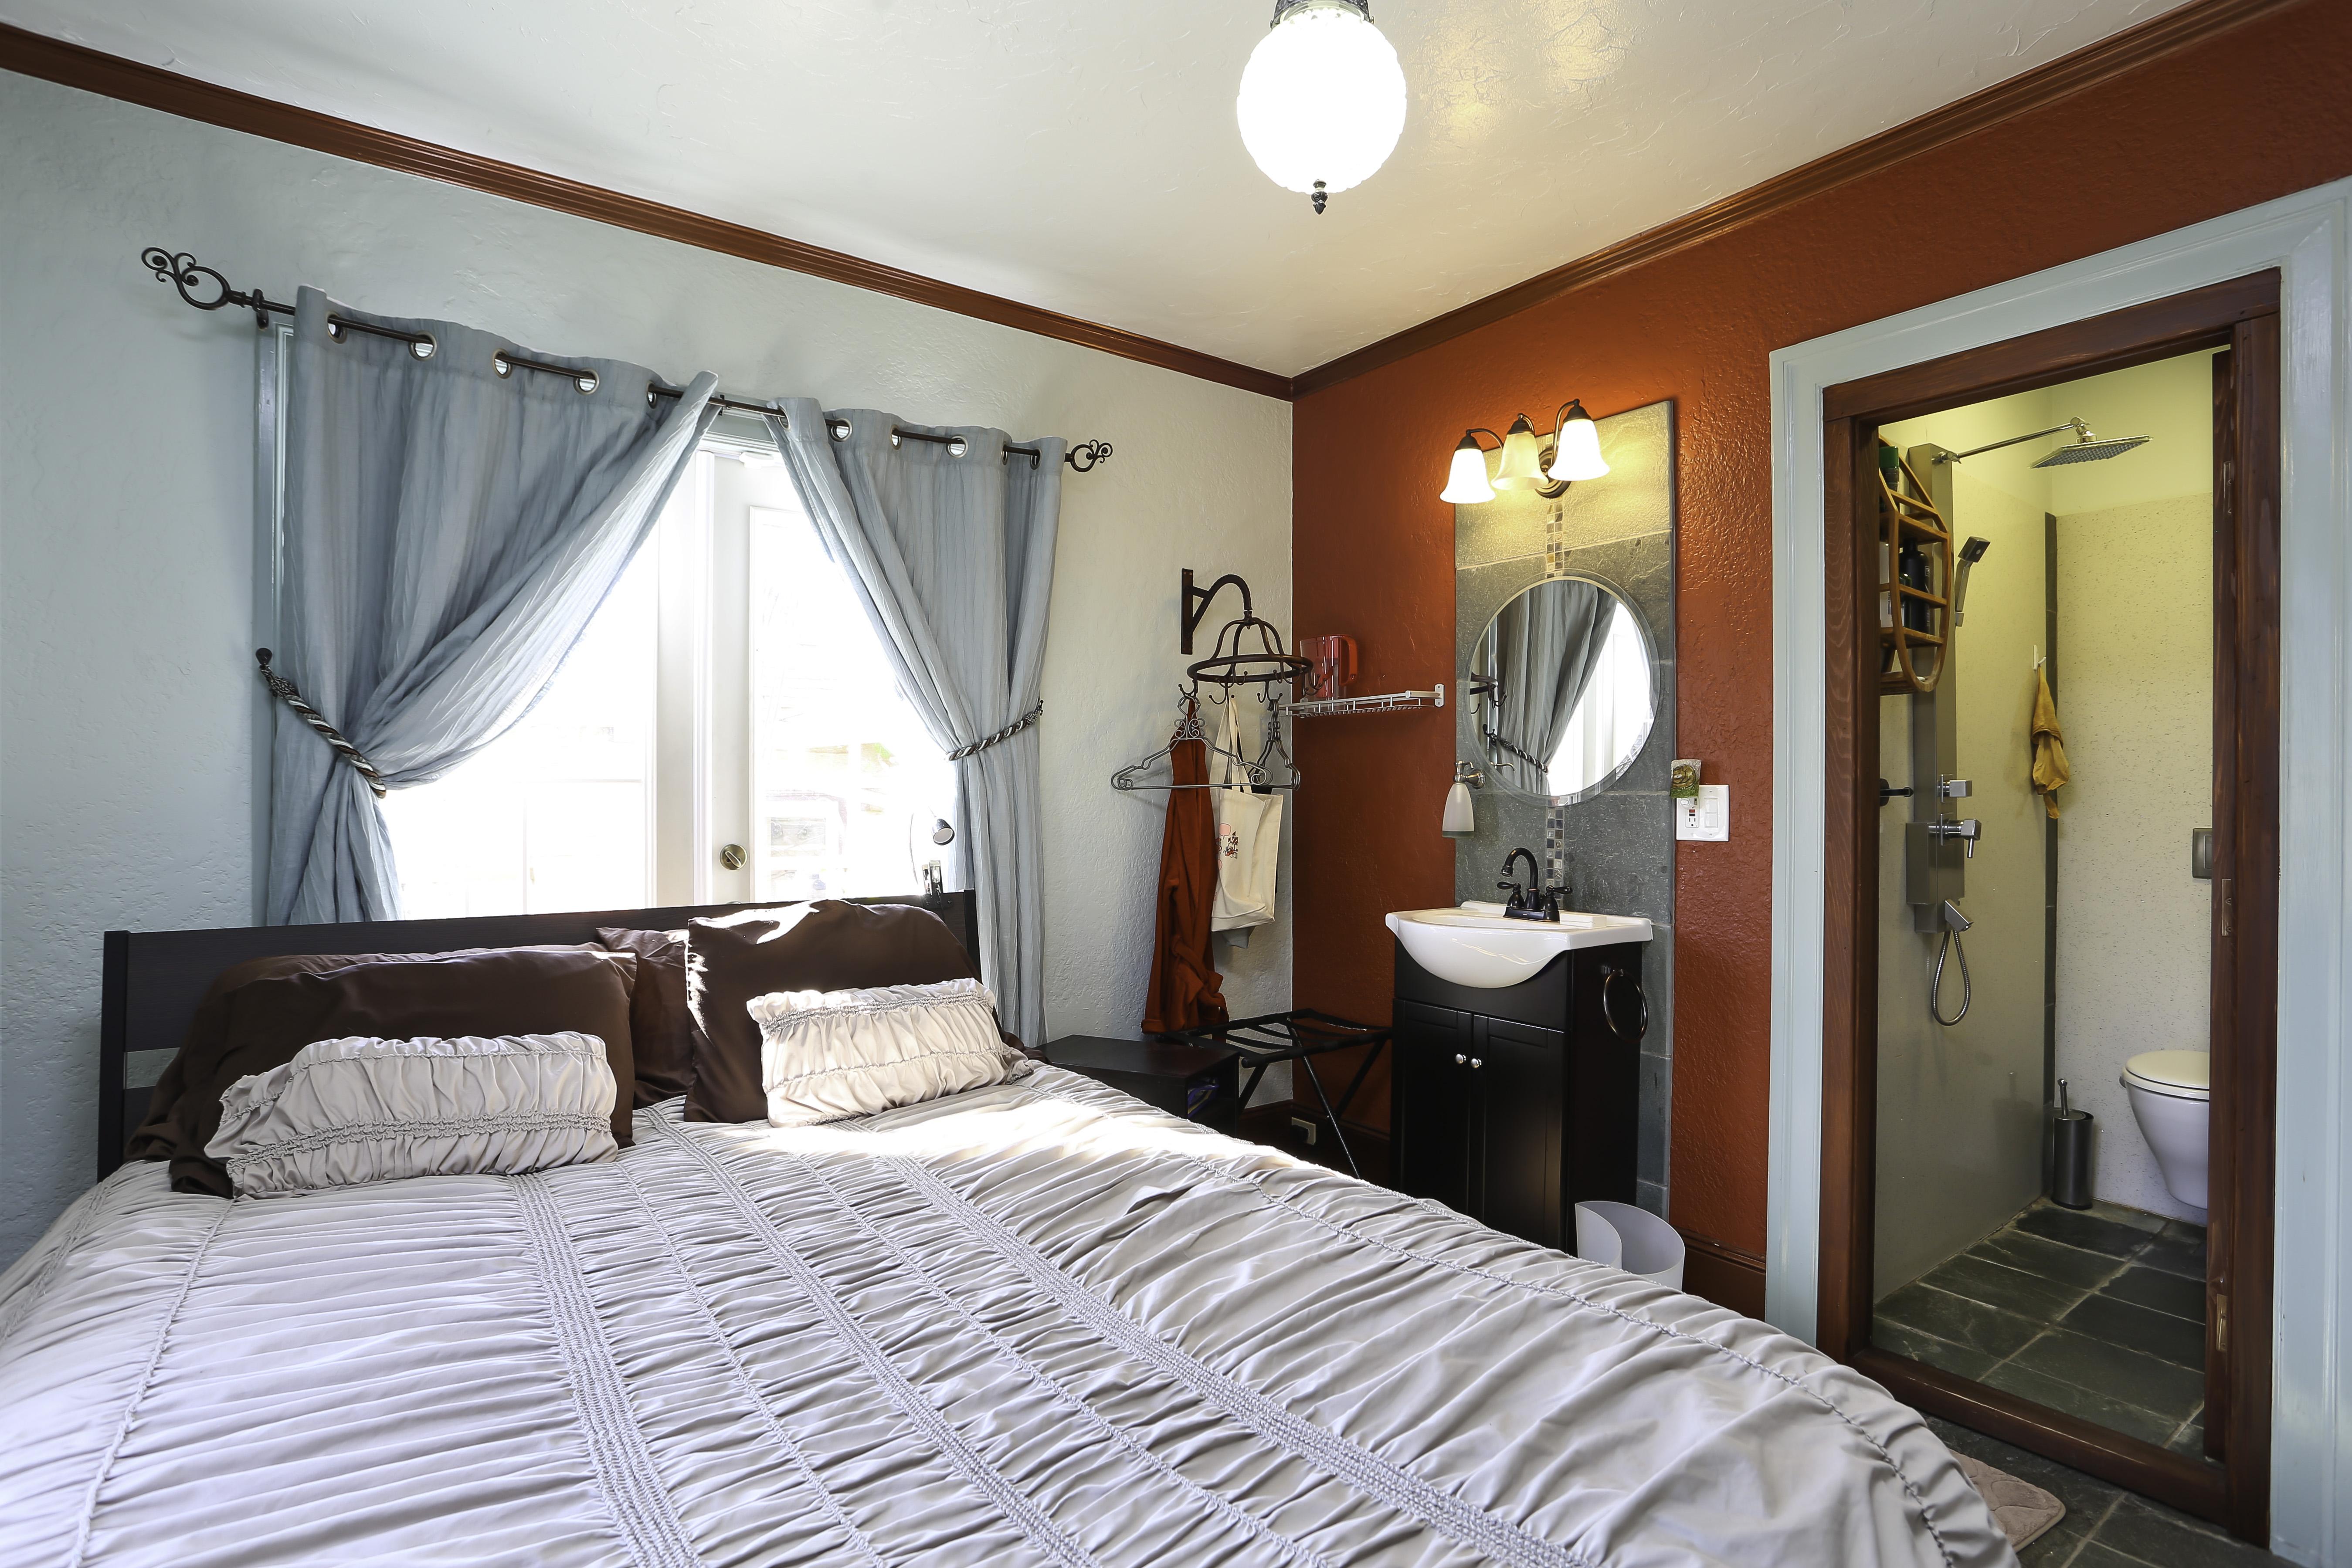 Bed Interior 1